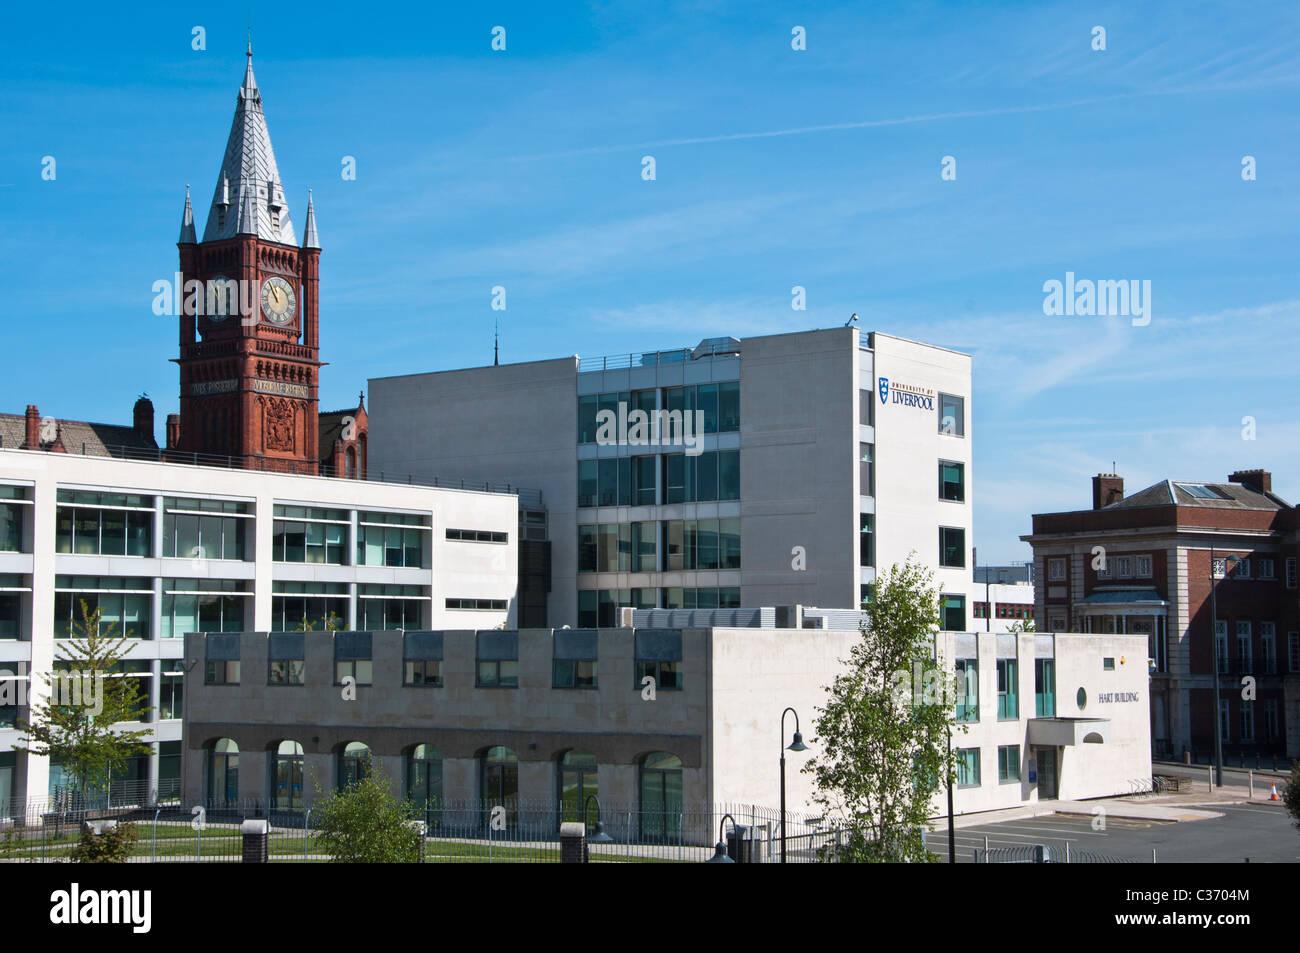 Liverpool University campus. Liverpool. England. - Stock Image